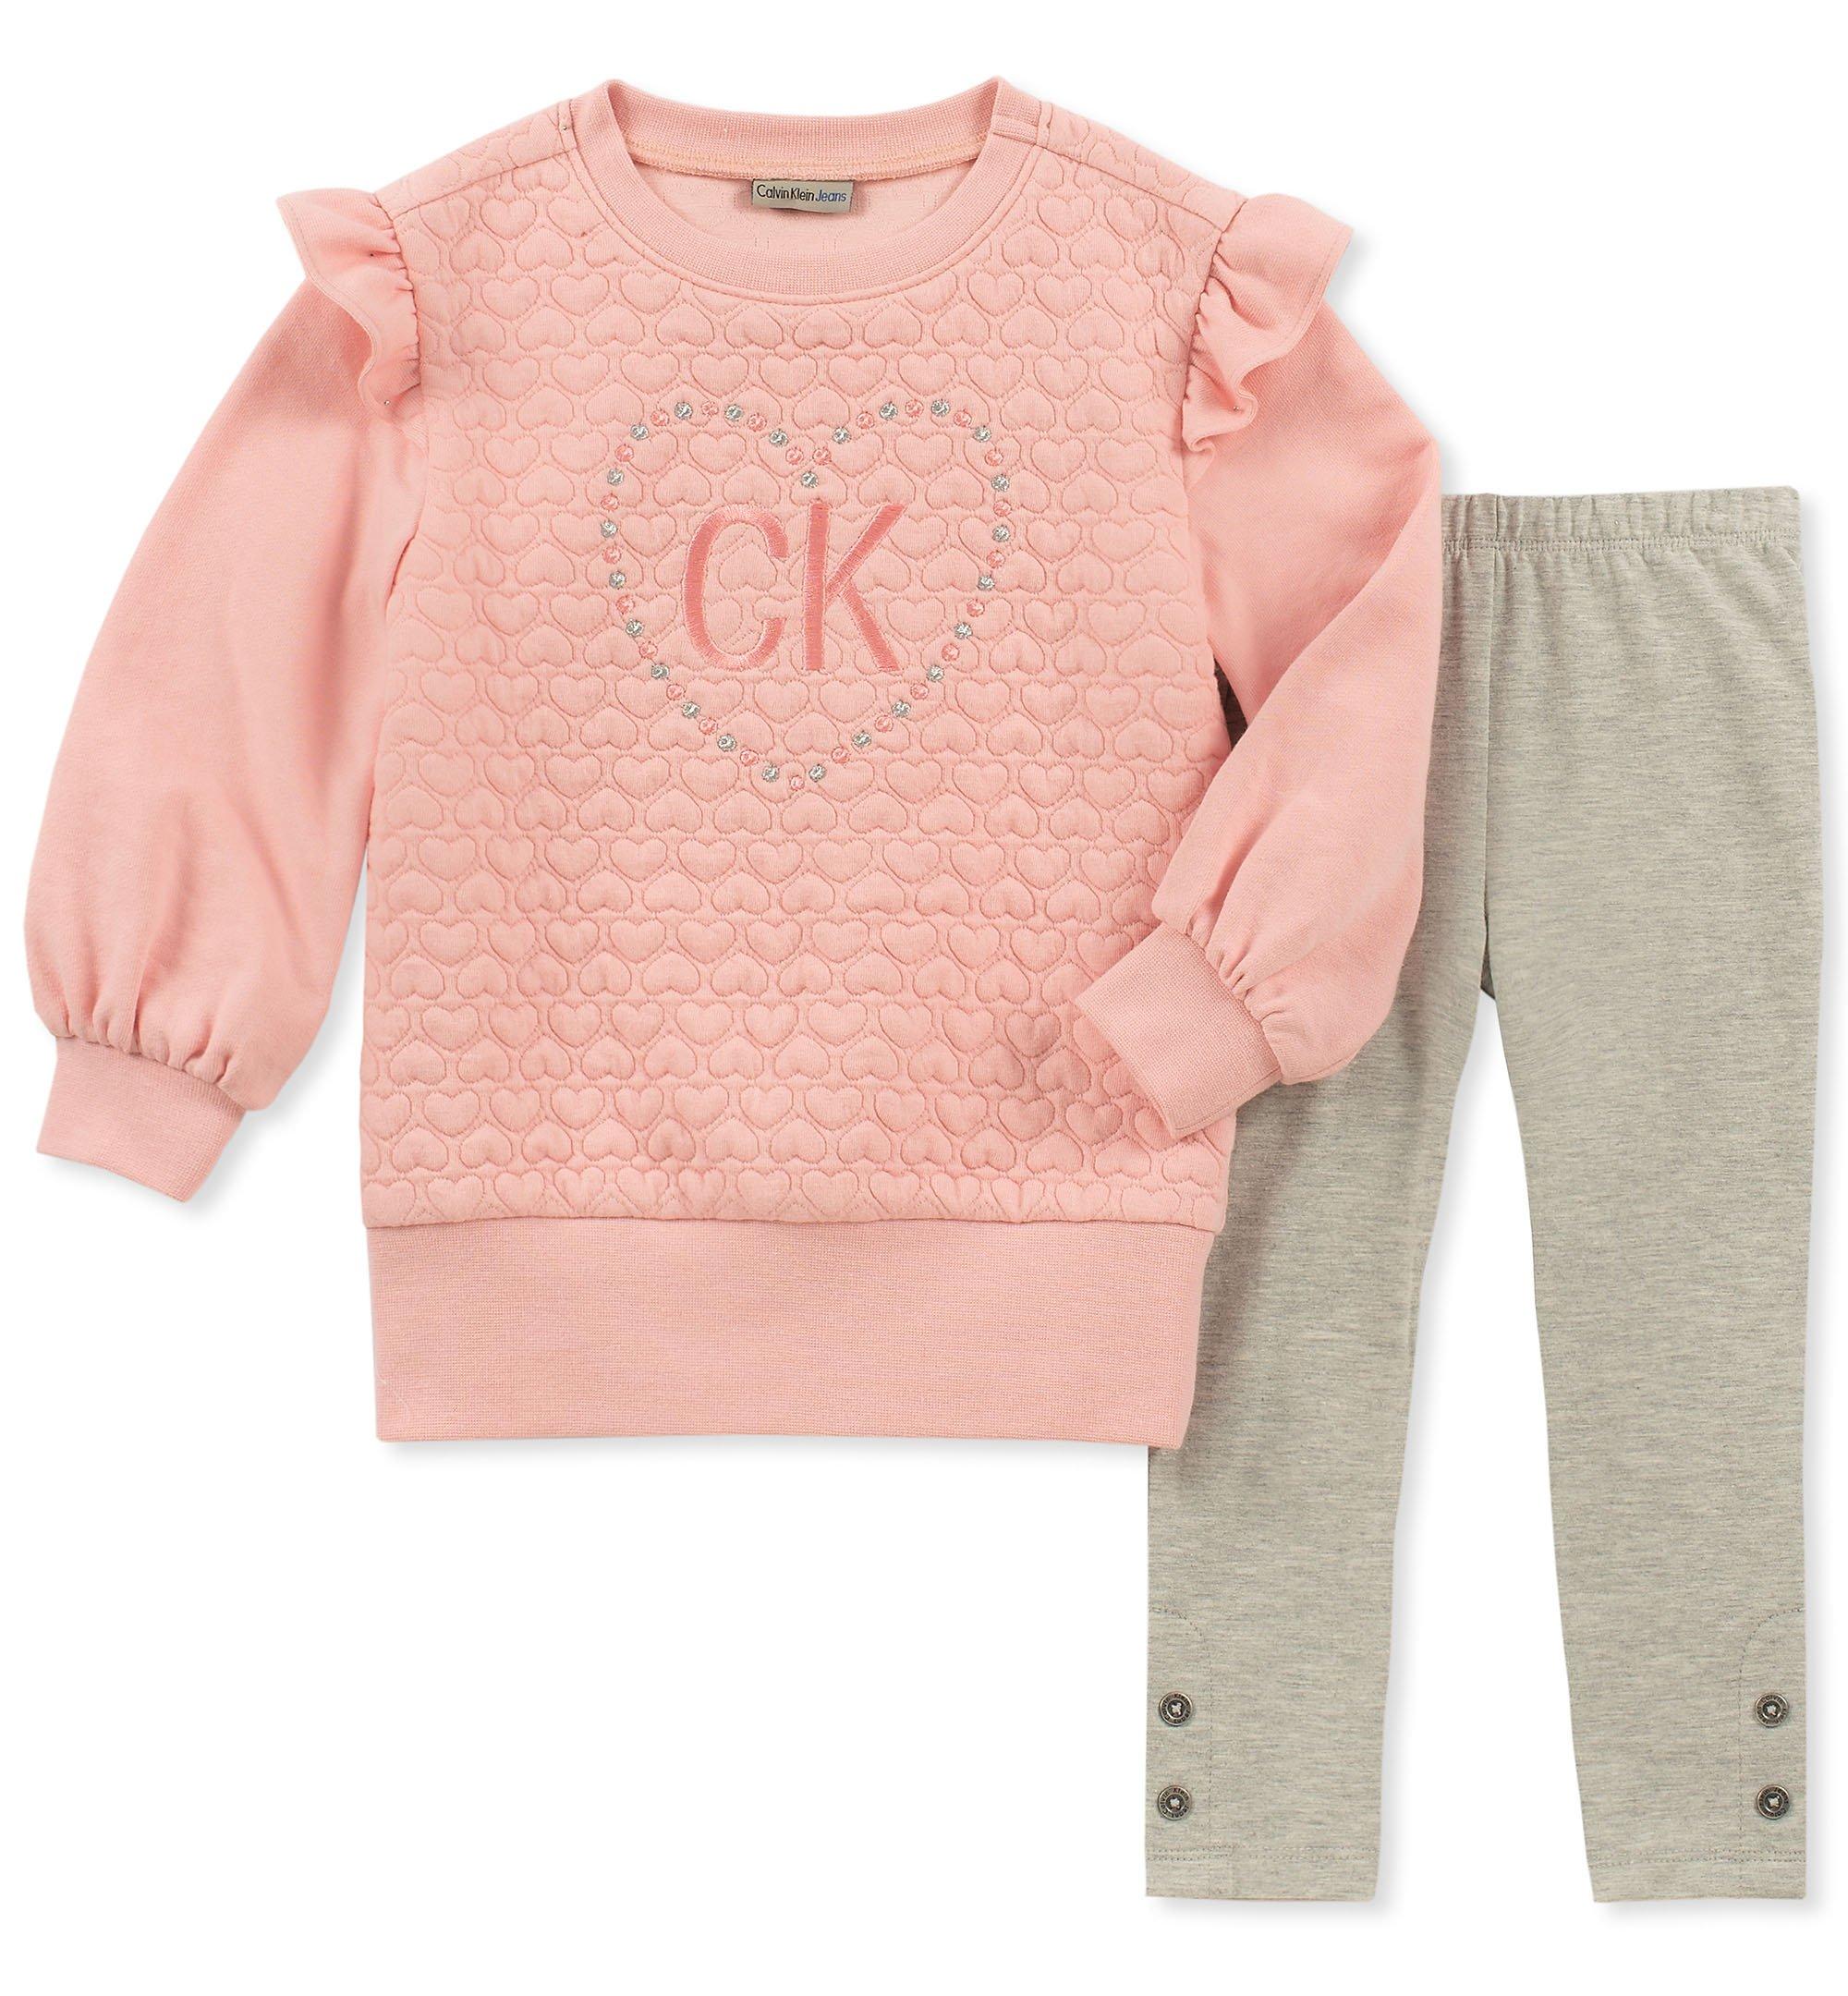 3a527fd4f44 Calvin Klein Baby Girls 2 Pieces Tunic Set, Strawberry crème/Gray, 12M